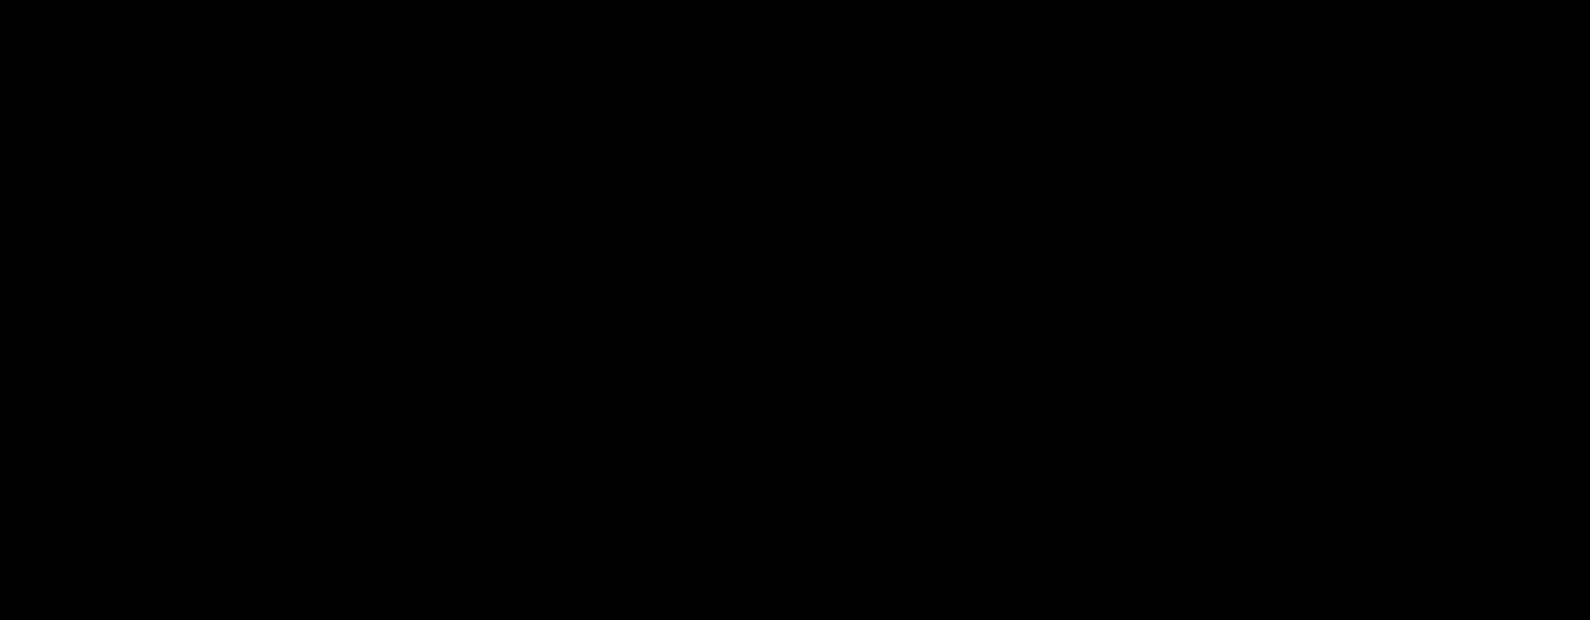 2-[1-(4-Piperonyl)piperazinyl]benzothiazole